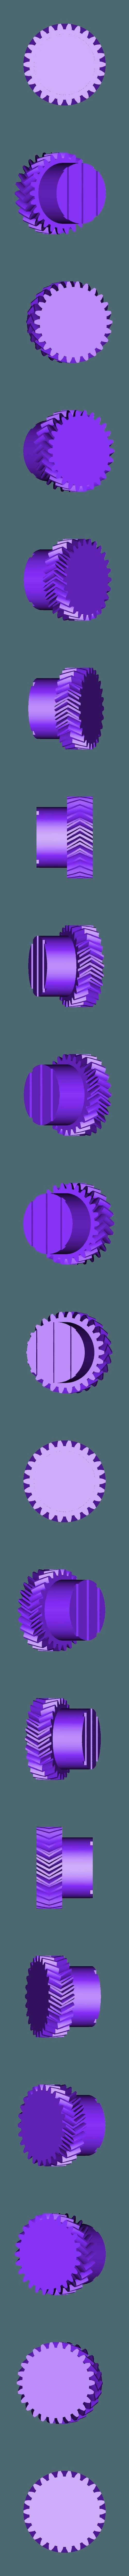 sungear.stl Download free STL file Wind turbine for 775 engine • 3D printer template, LetsPrintYT